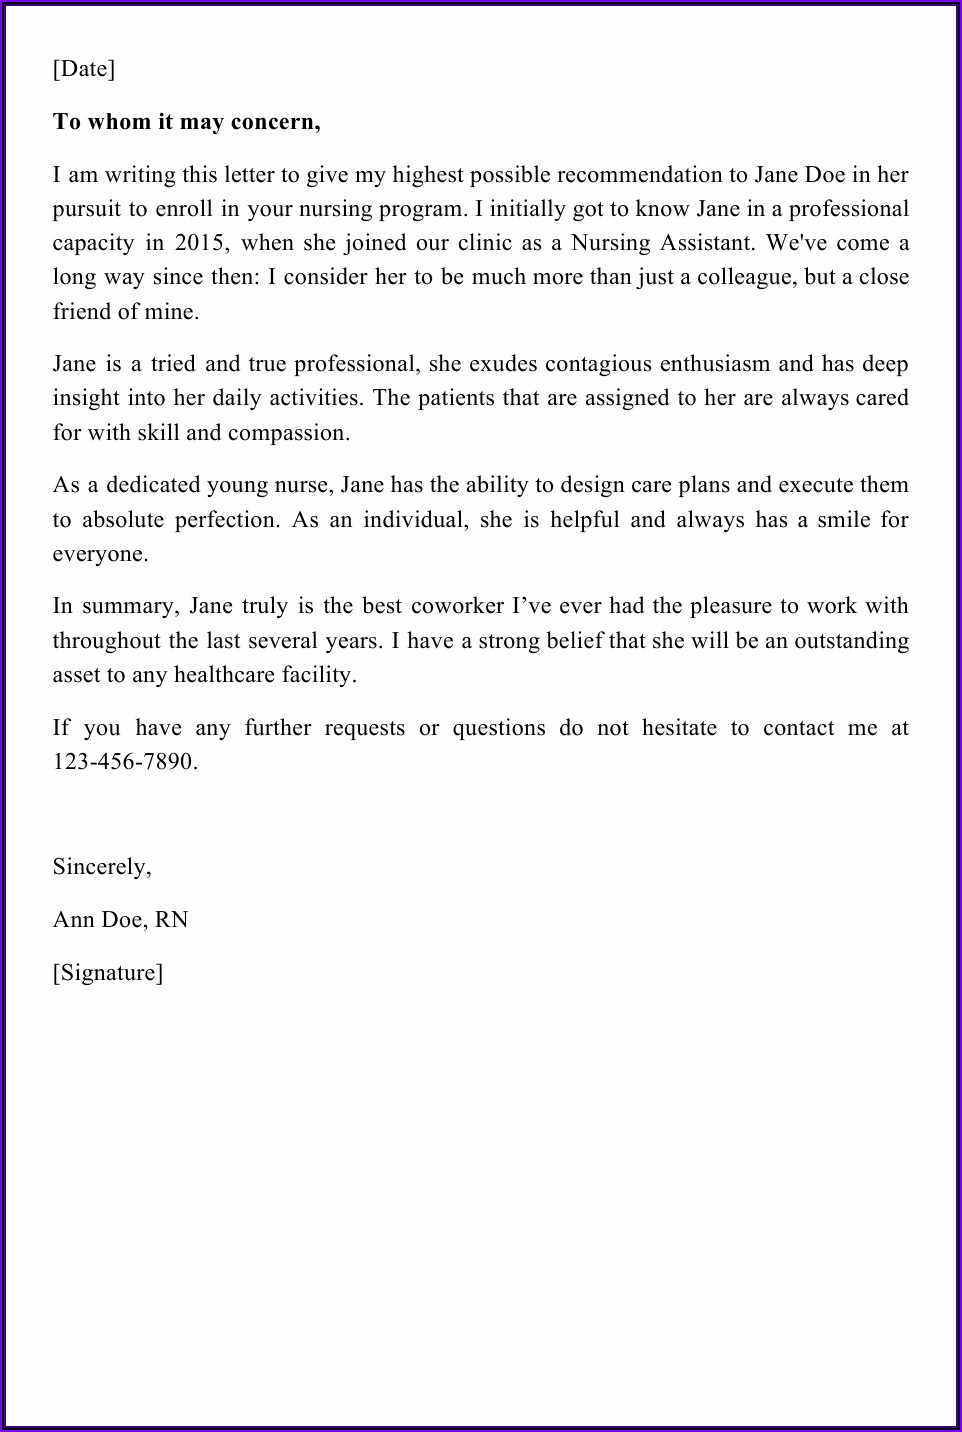 Letter Of Recommendation For Coworker Nursing Assistant